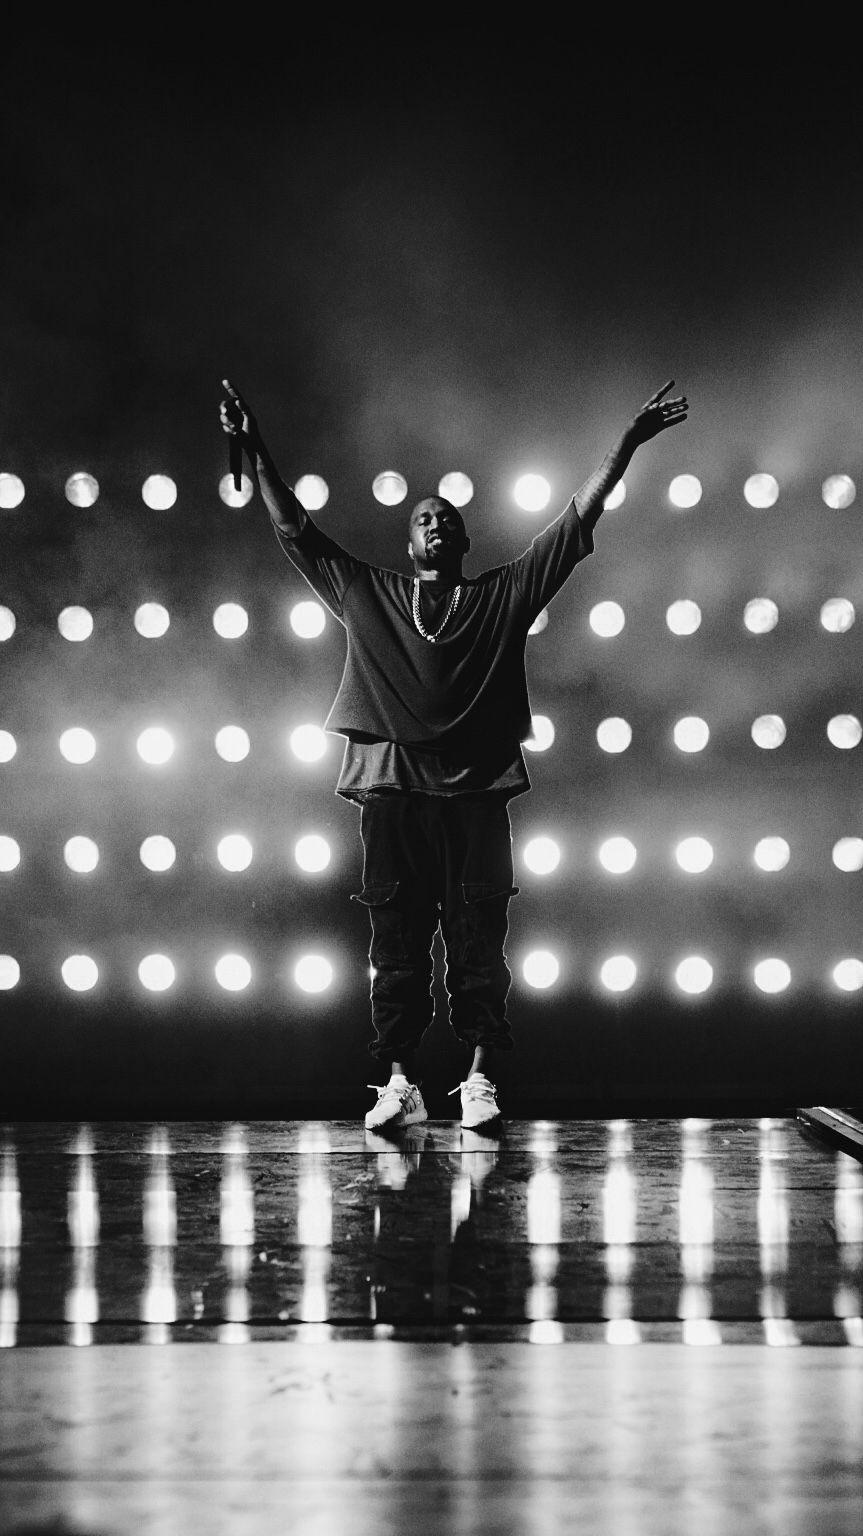 Kanyewest Kanye West Wallpaper Rap Wallpaper Gangsta Rap